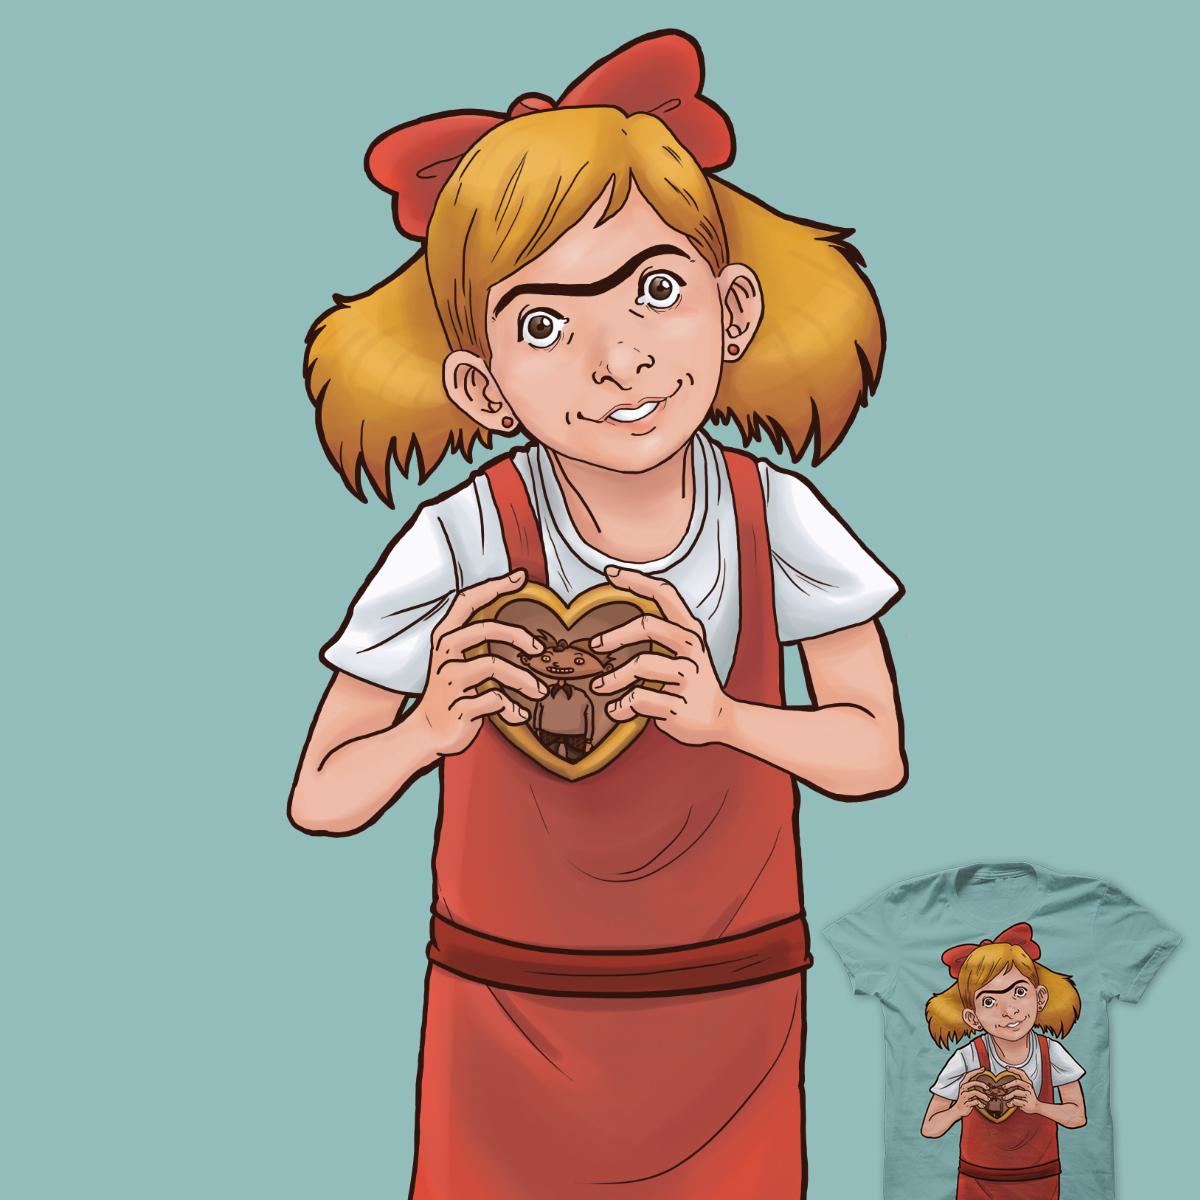 Overly Attached Helga by Daviisilva and bernardog on Threadless